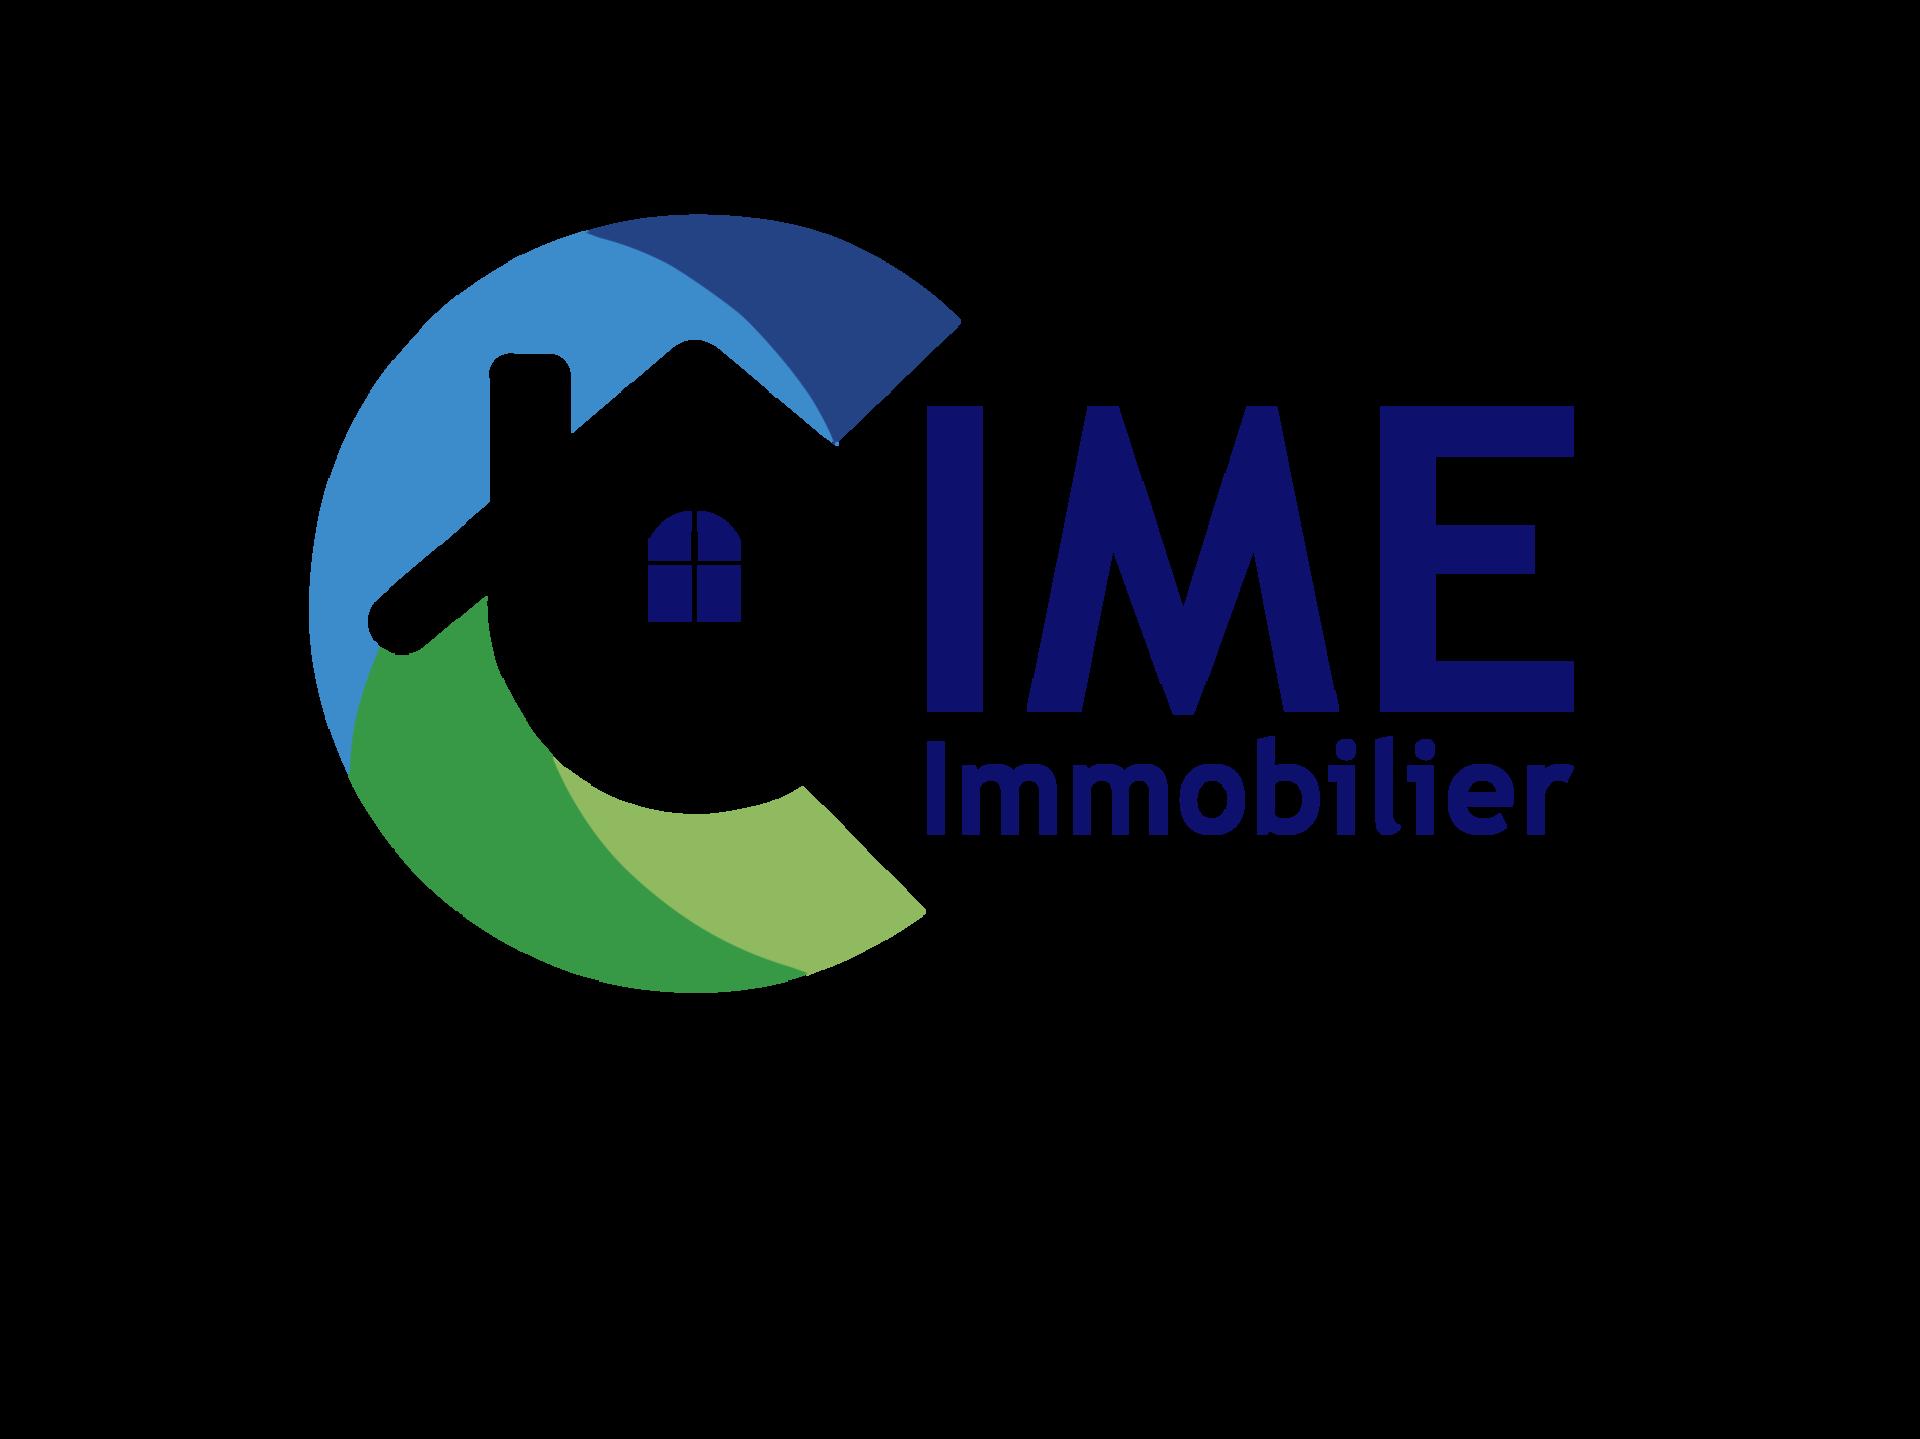 CIME IMMOBILIER BALLAINVILIERS